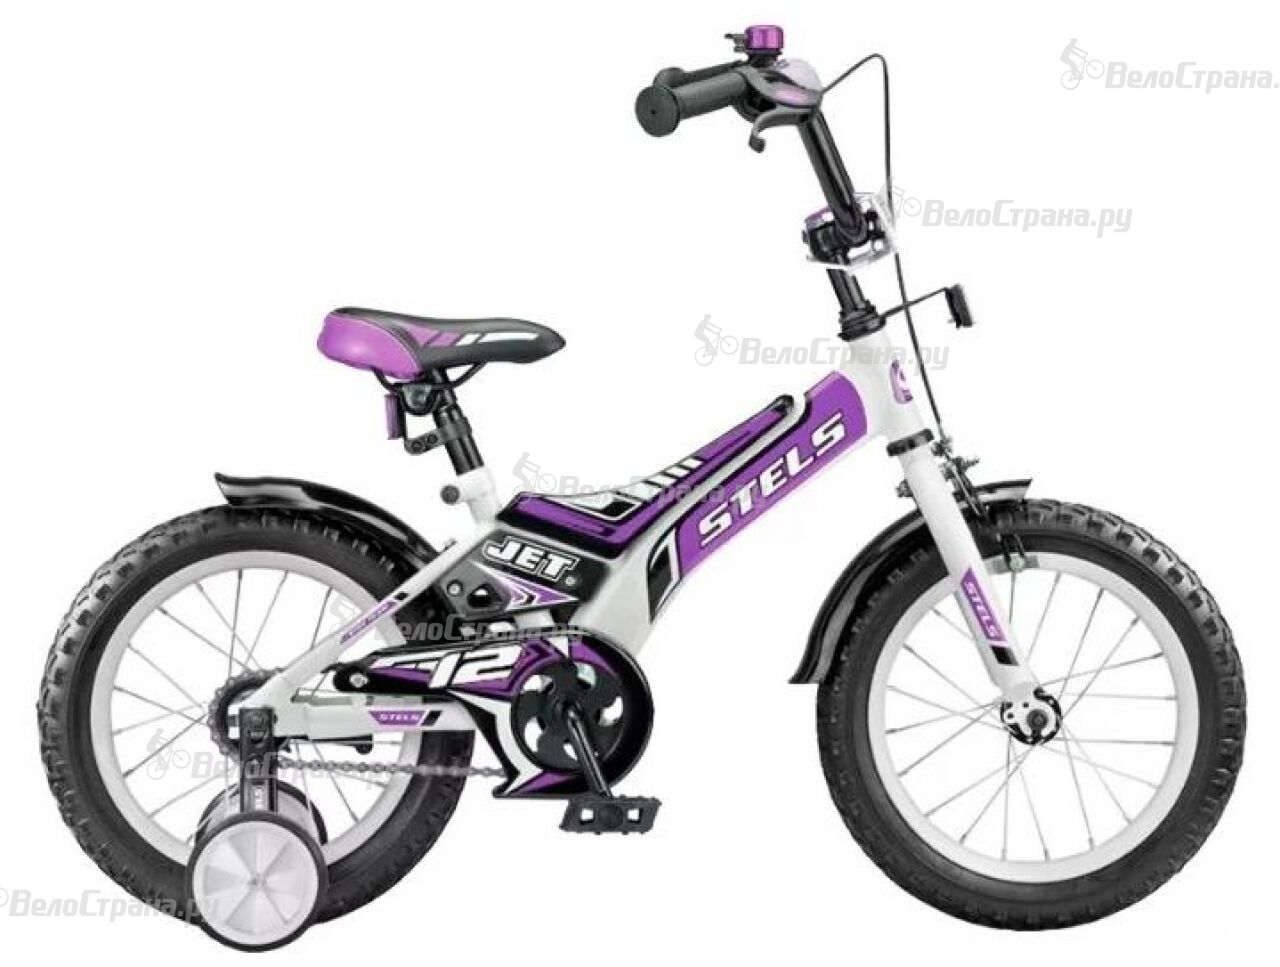 Велосипед Stels Jet 12 V021 (2018) велосипед stels energy iv v020 2018